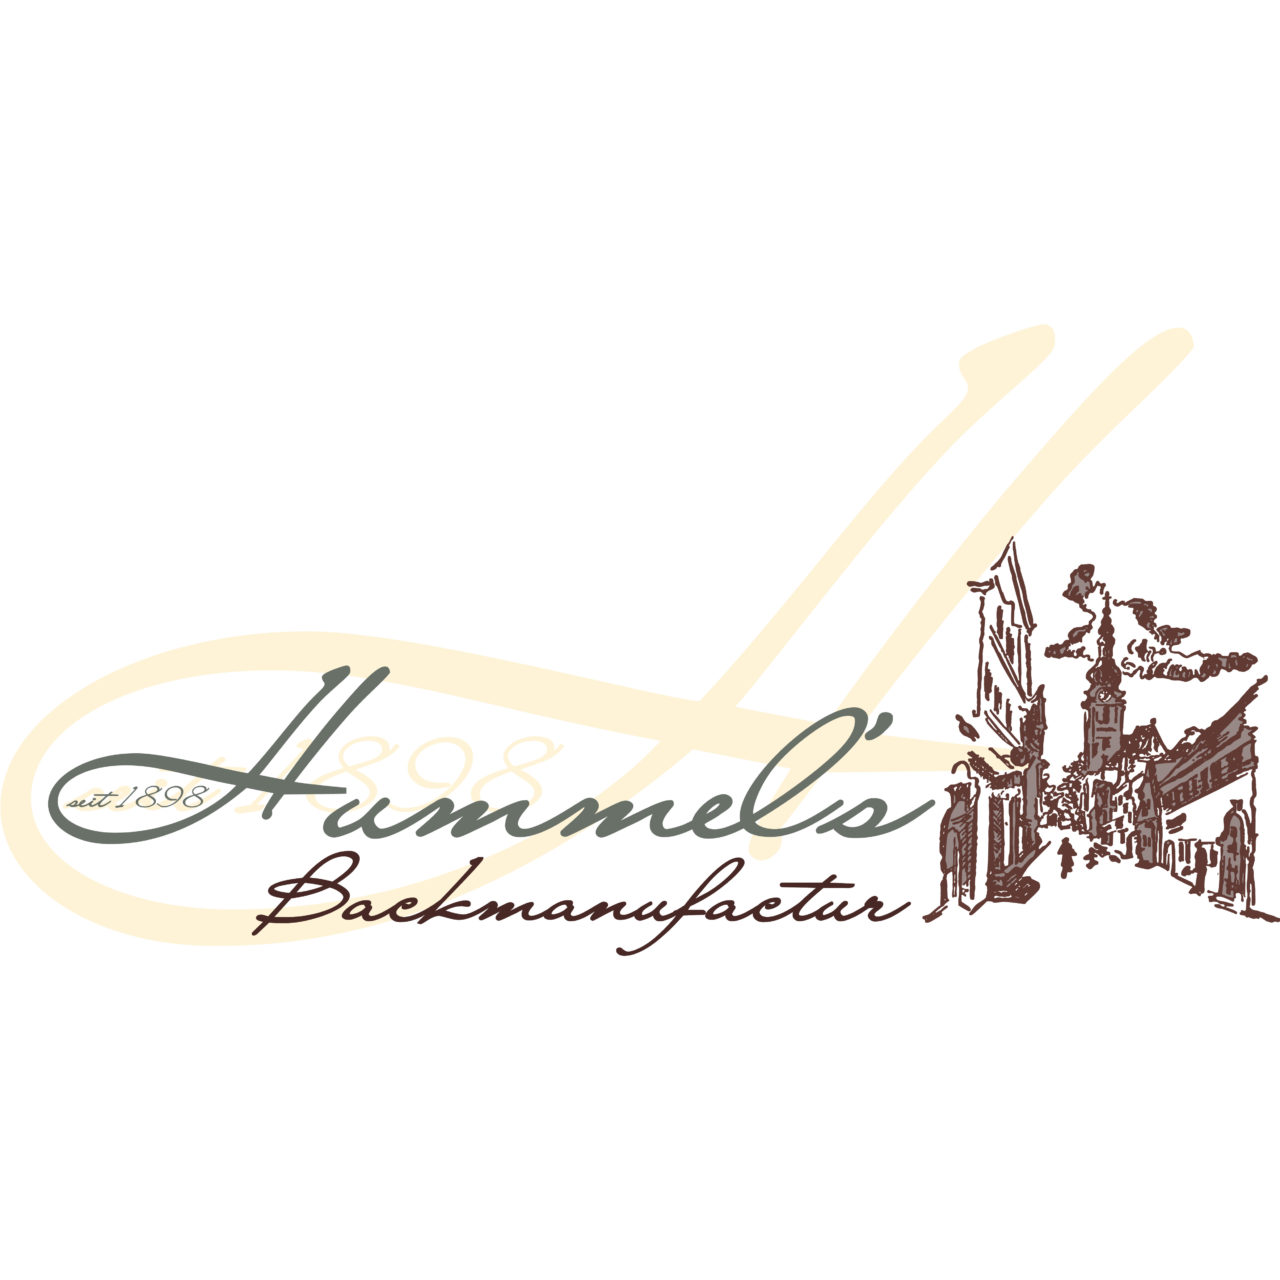 https://www.hummels-krapferl.at/wp-content/uploads/2019/08/Presse_3-1280x1280.jpg